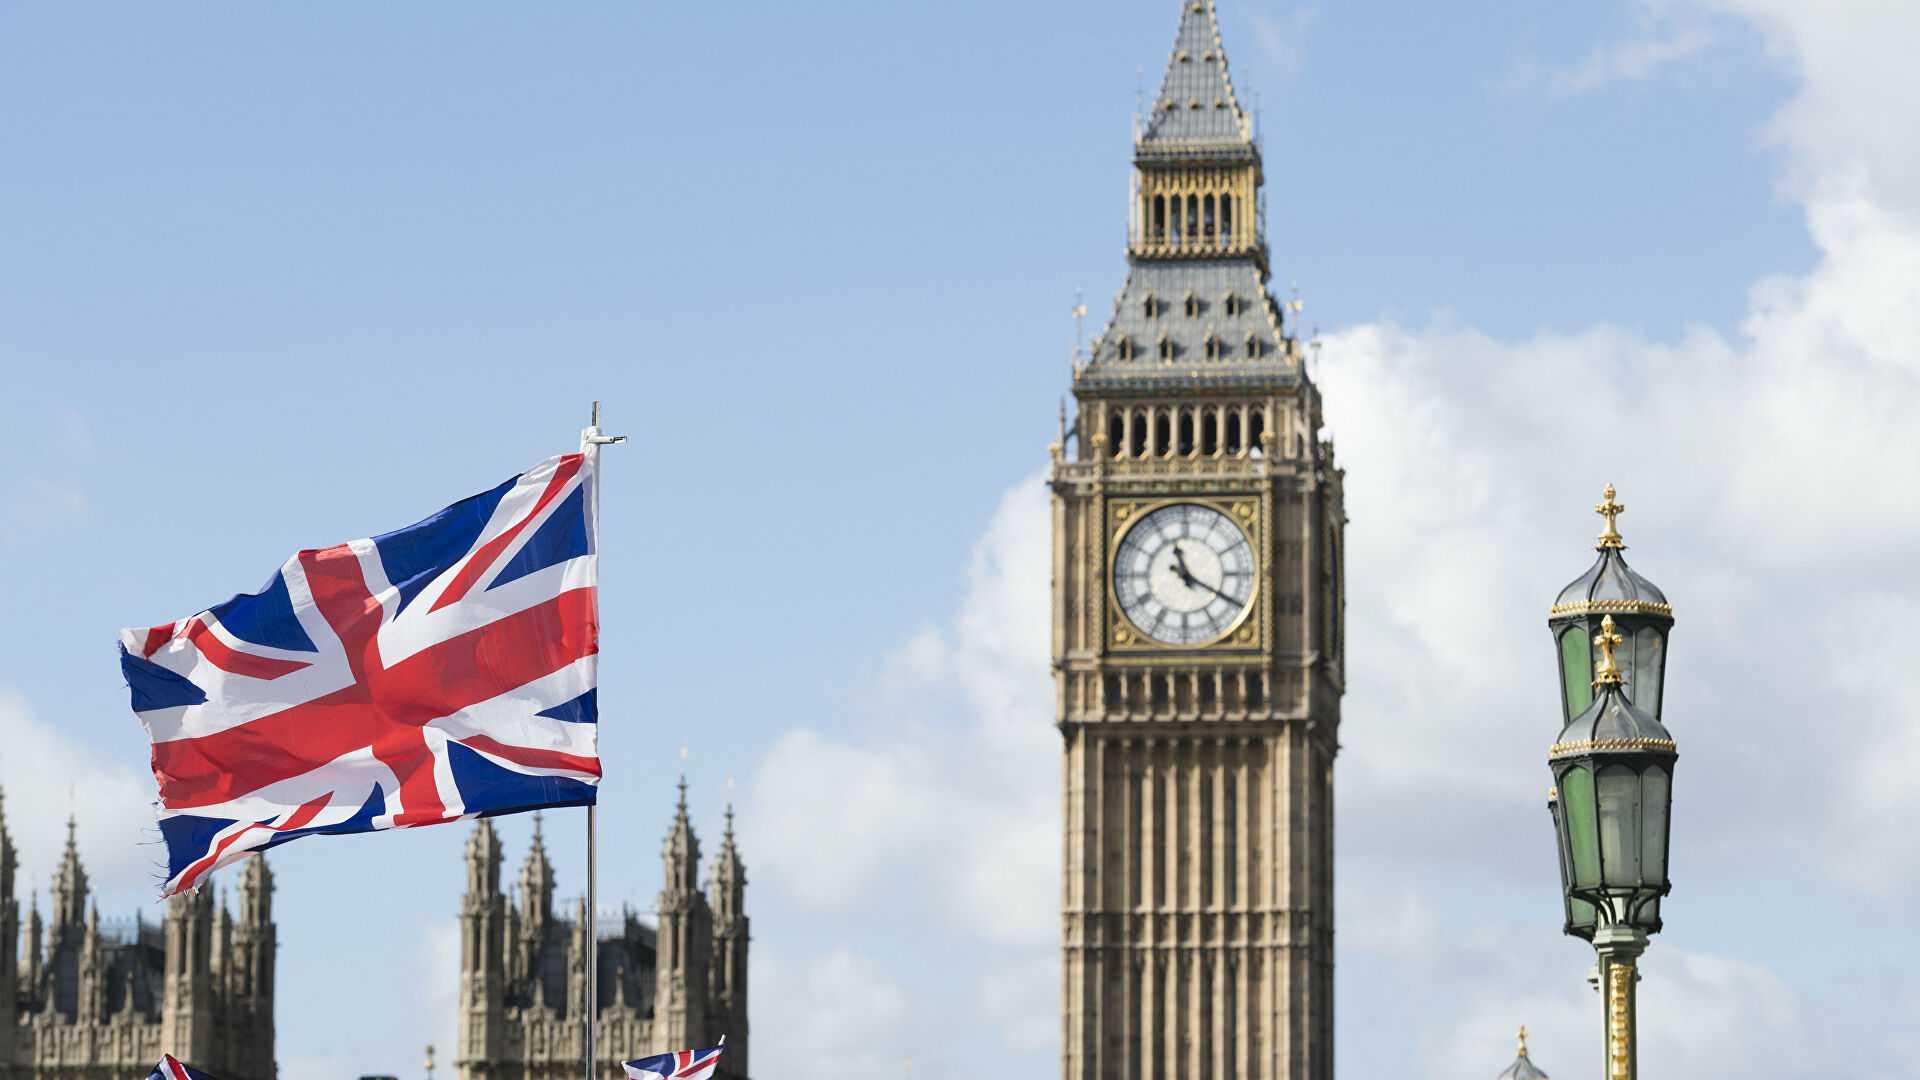 И снова здравствуйте: в Британии обвинили Москву в «газовом кризисе»